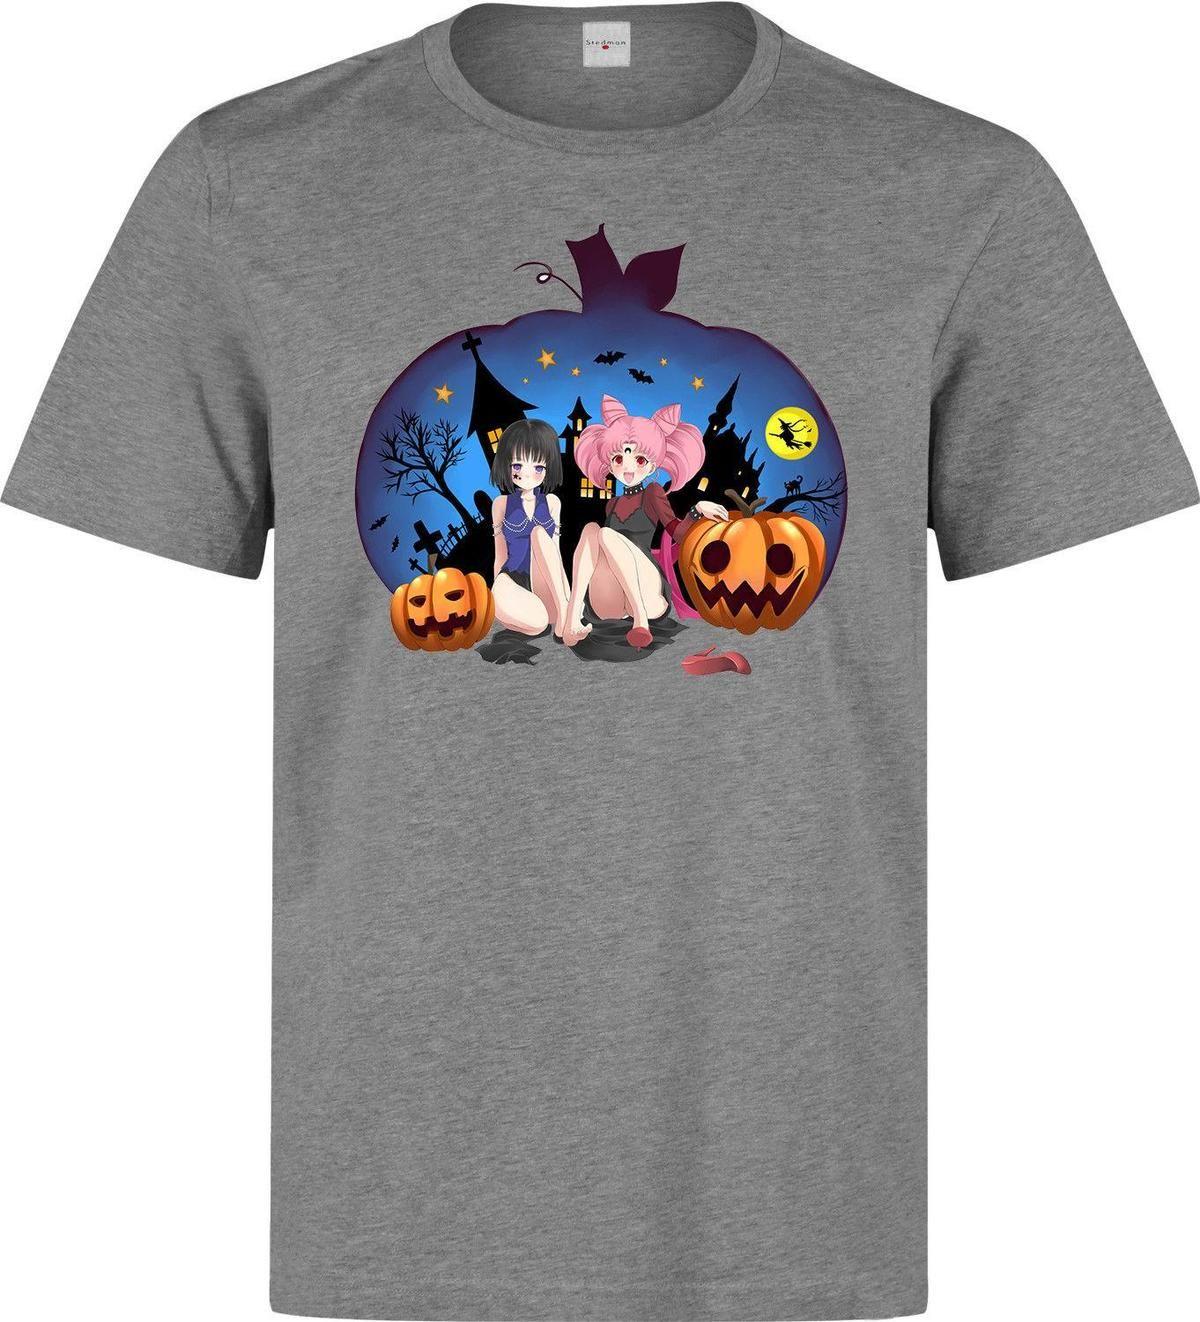 d0197c5a Anime Halloween Pumpkin Witch Girls Manga Men's (woman's available) grey t  shirt